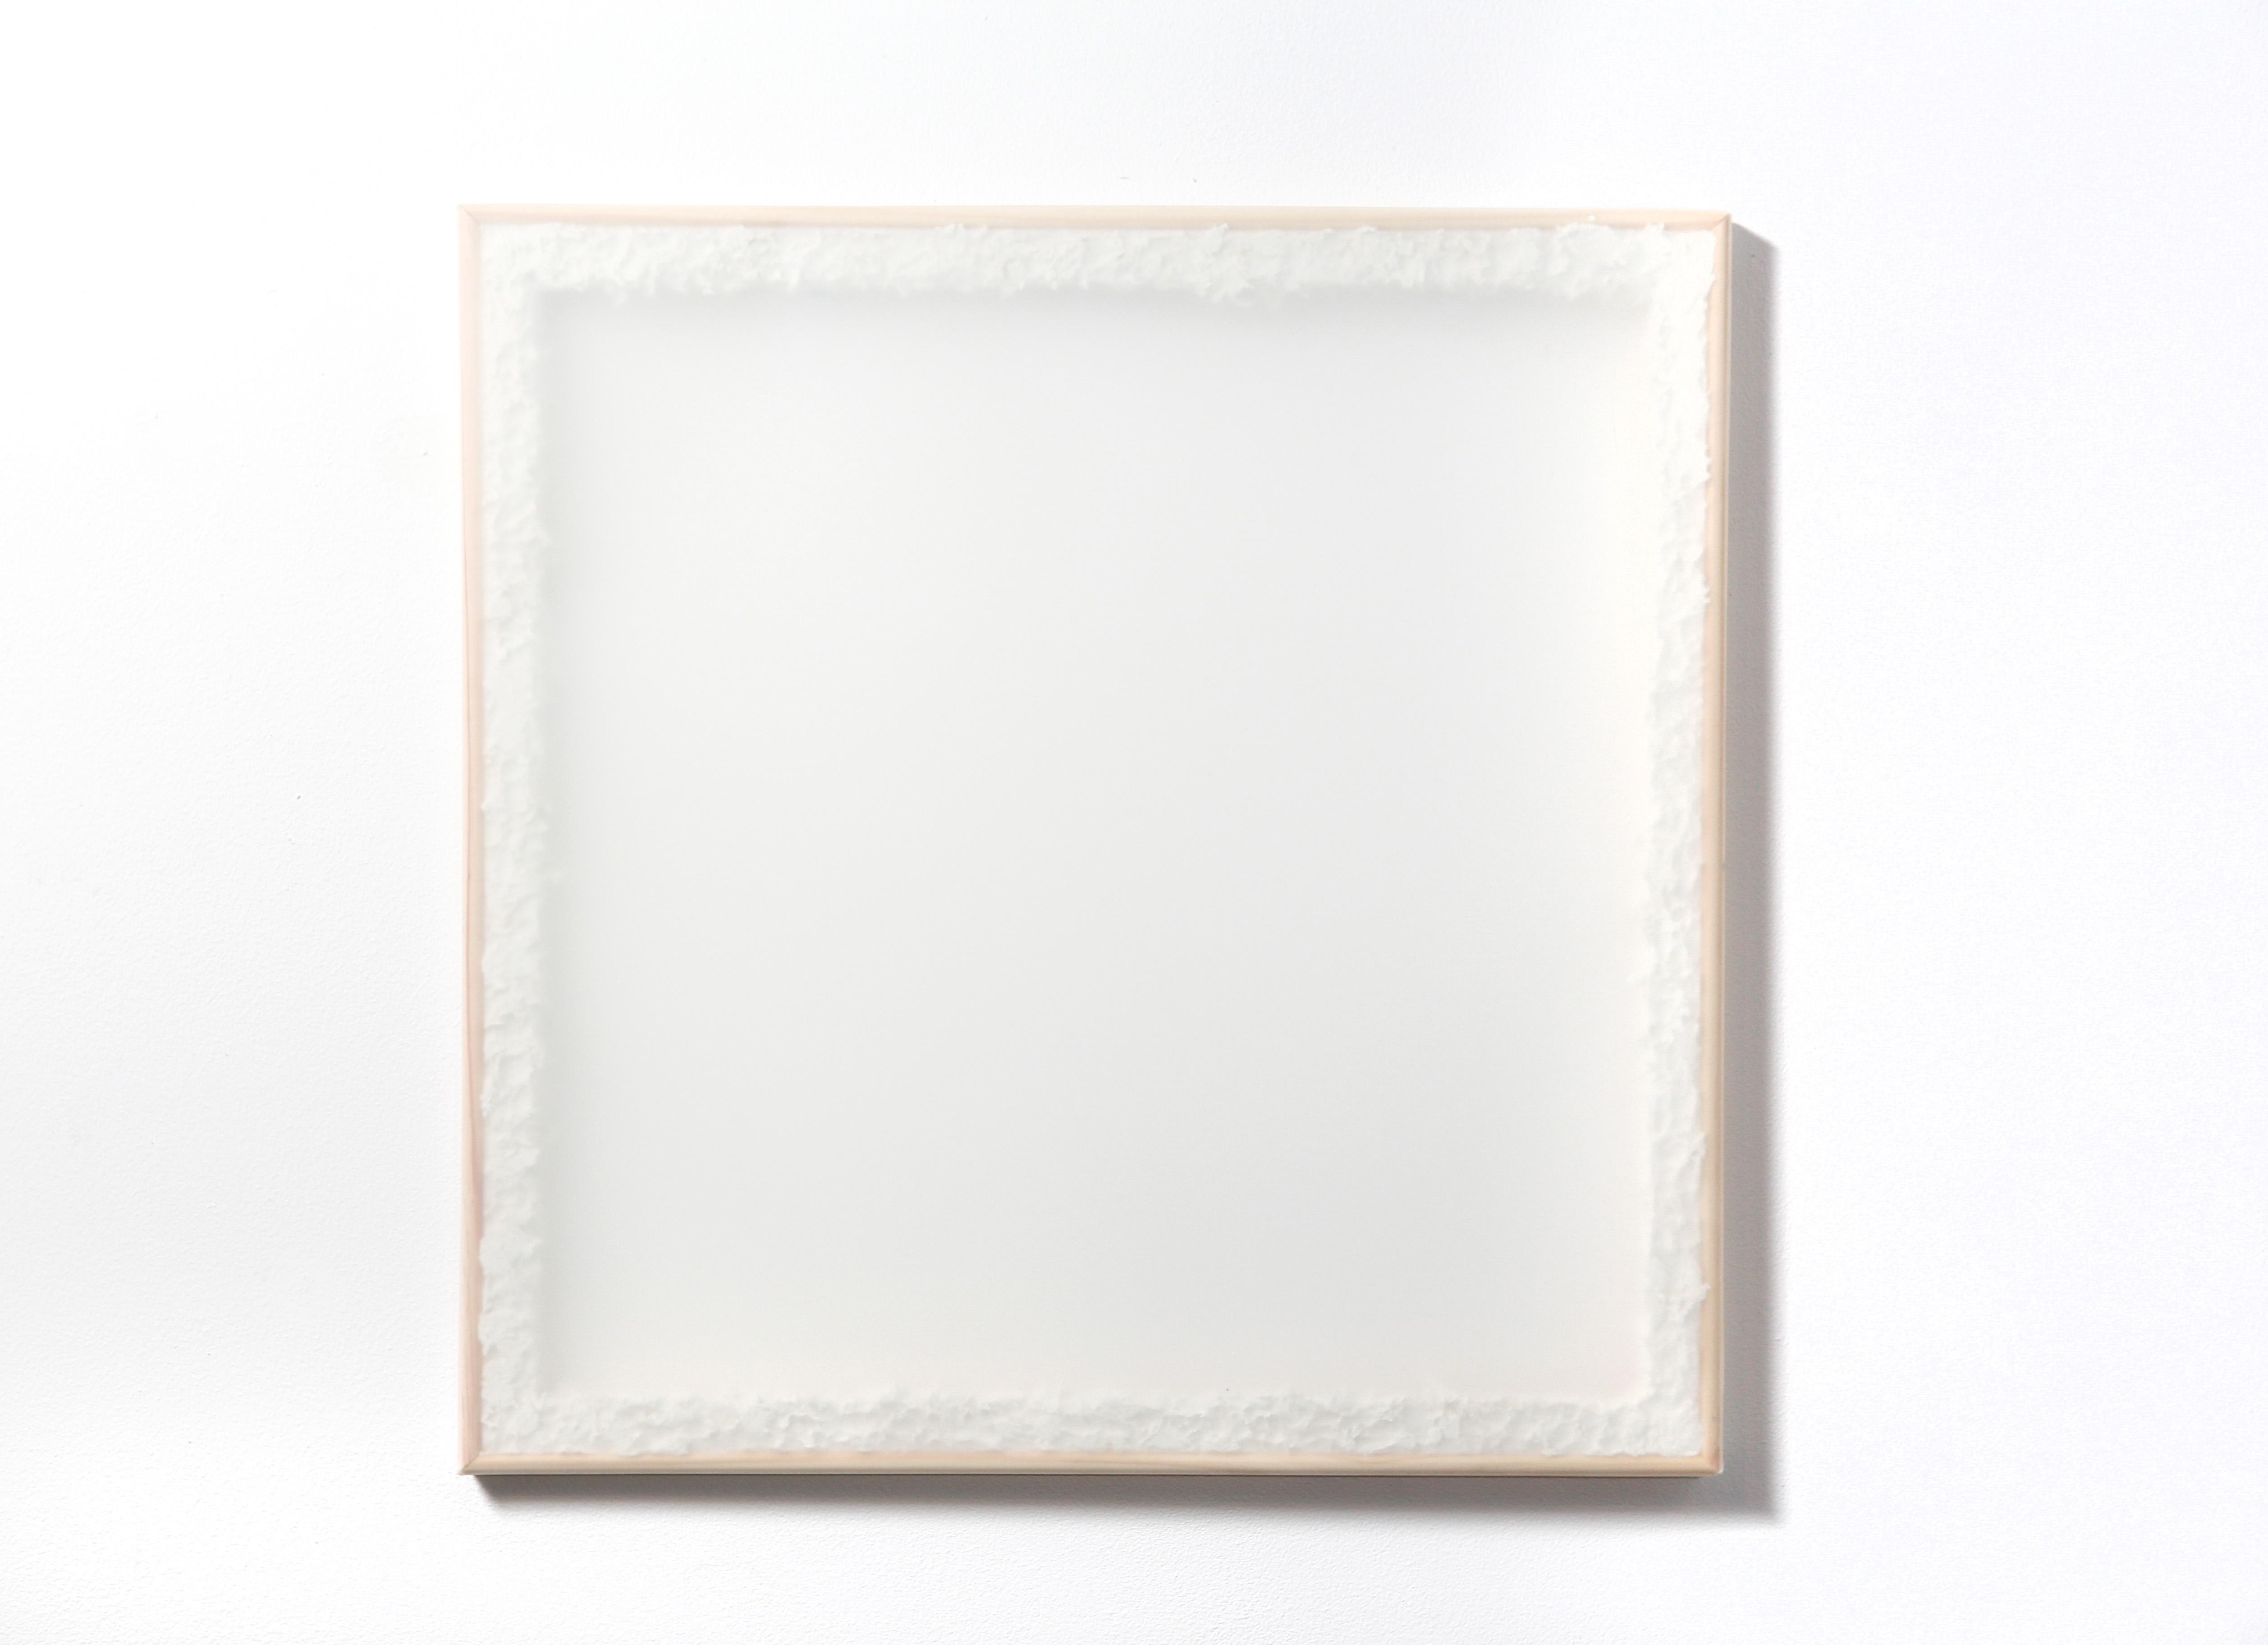 Square - White Texture. 2018